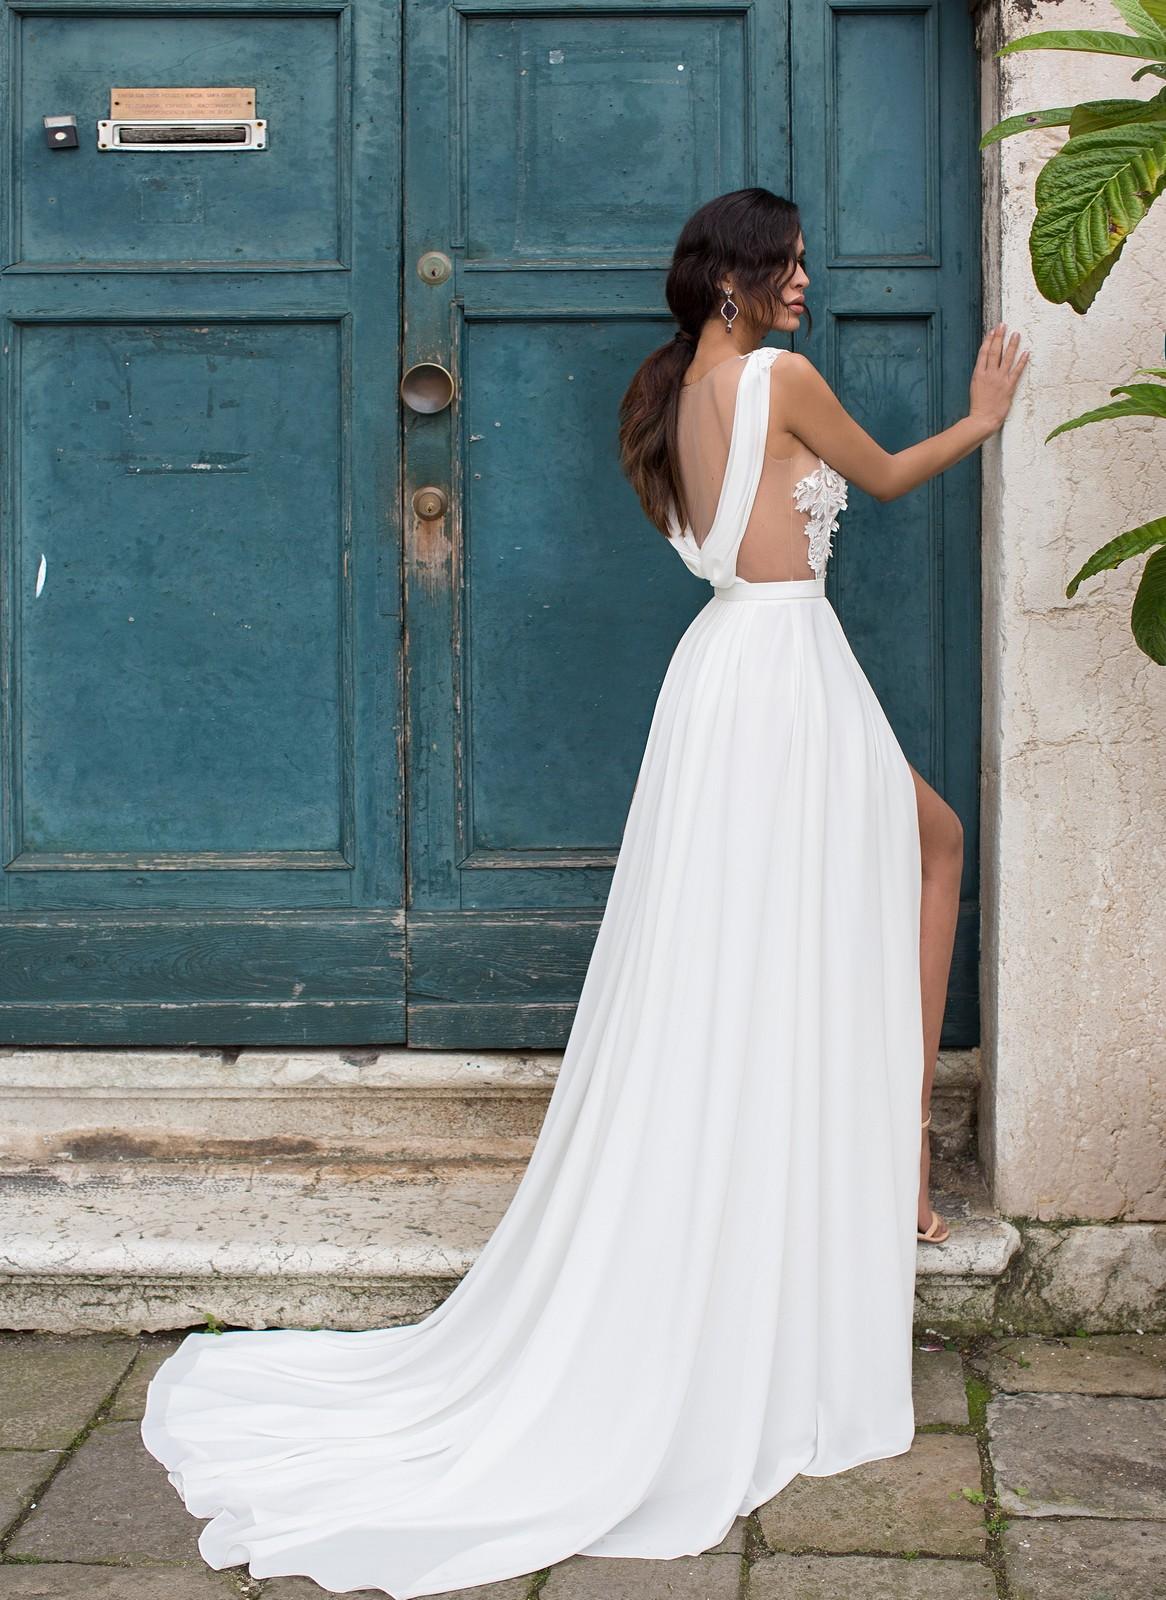 LA NOVIA Couture - Wedding dresses in Latvia - Atelier Bizar - Victoria